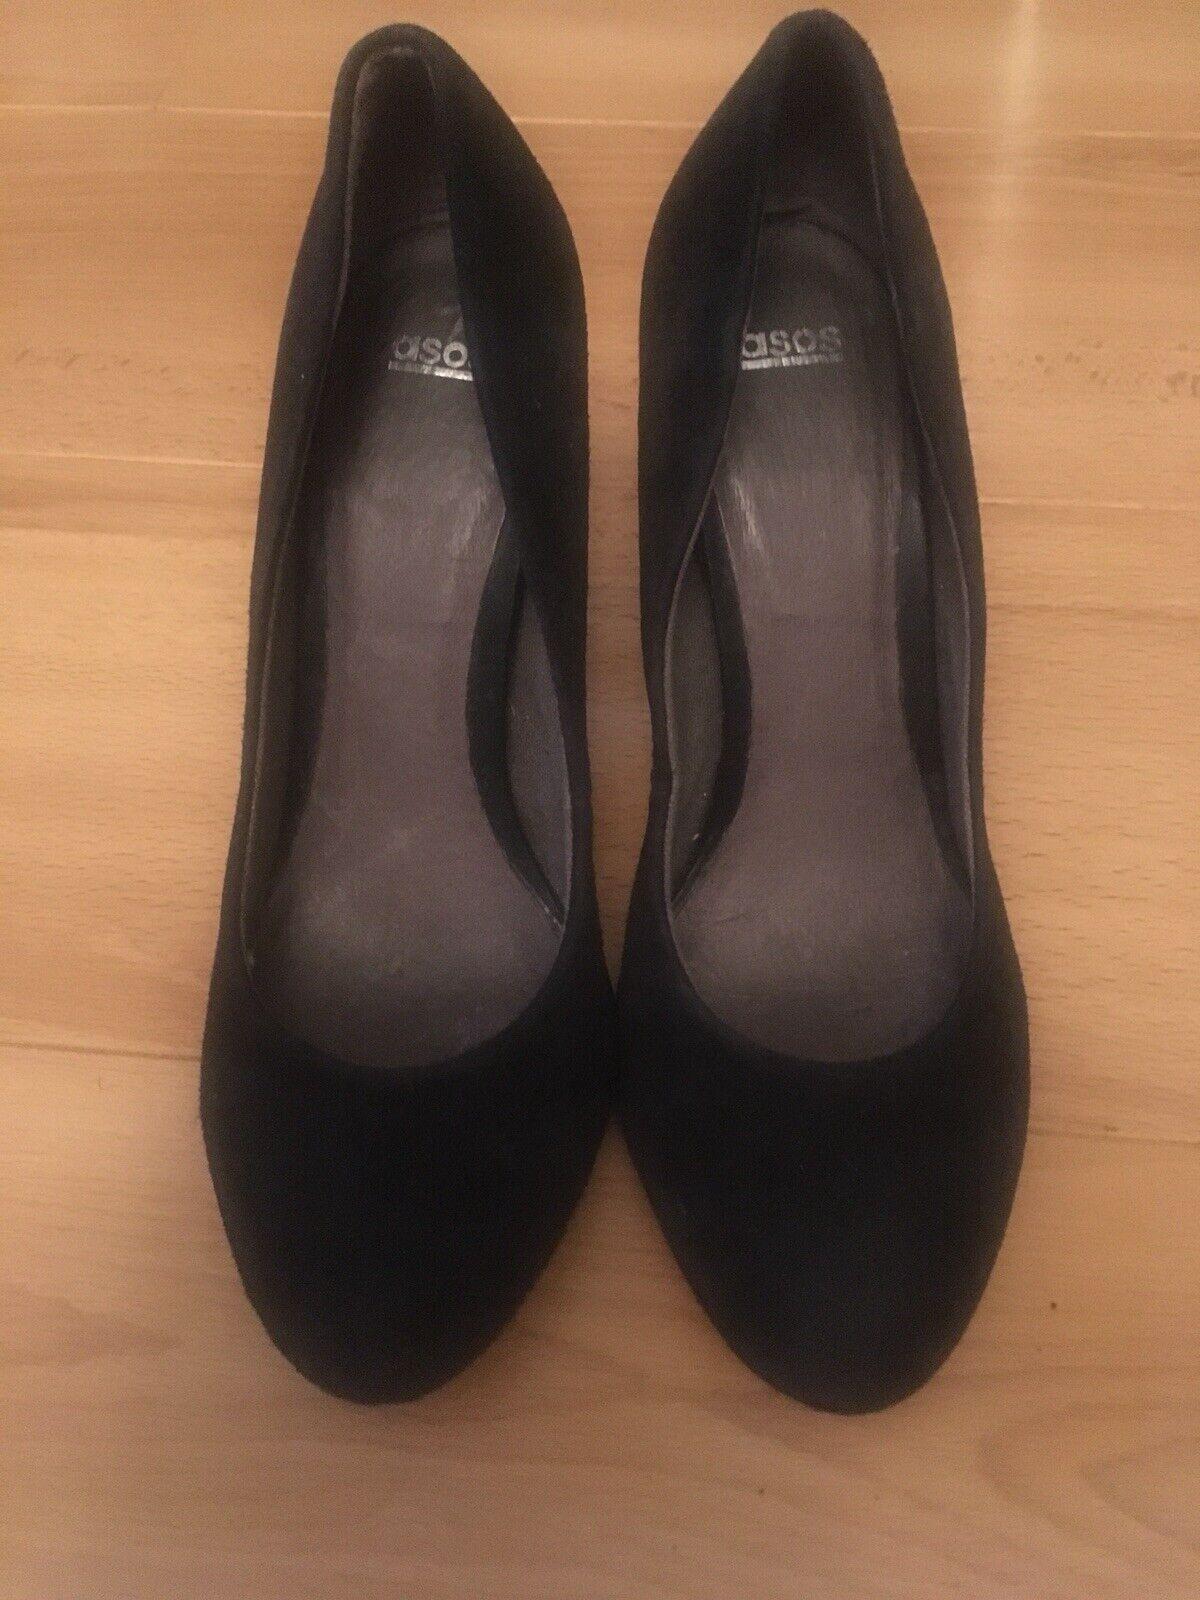 Ladies Asos size UK 6. EU 39 Black suede Court Round Toe shoes heels